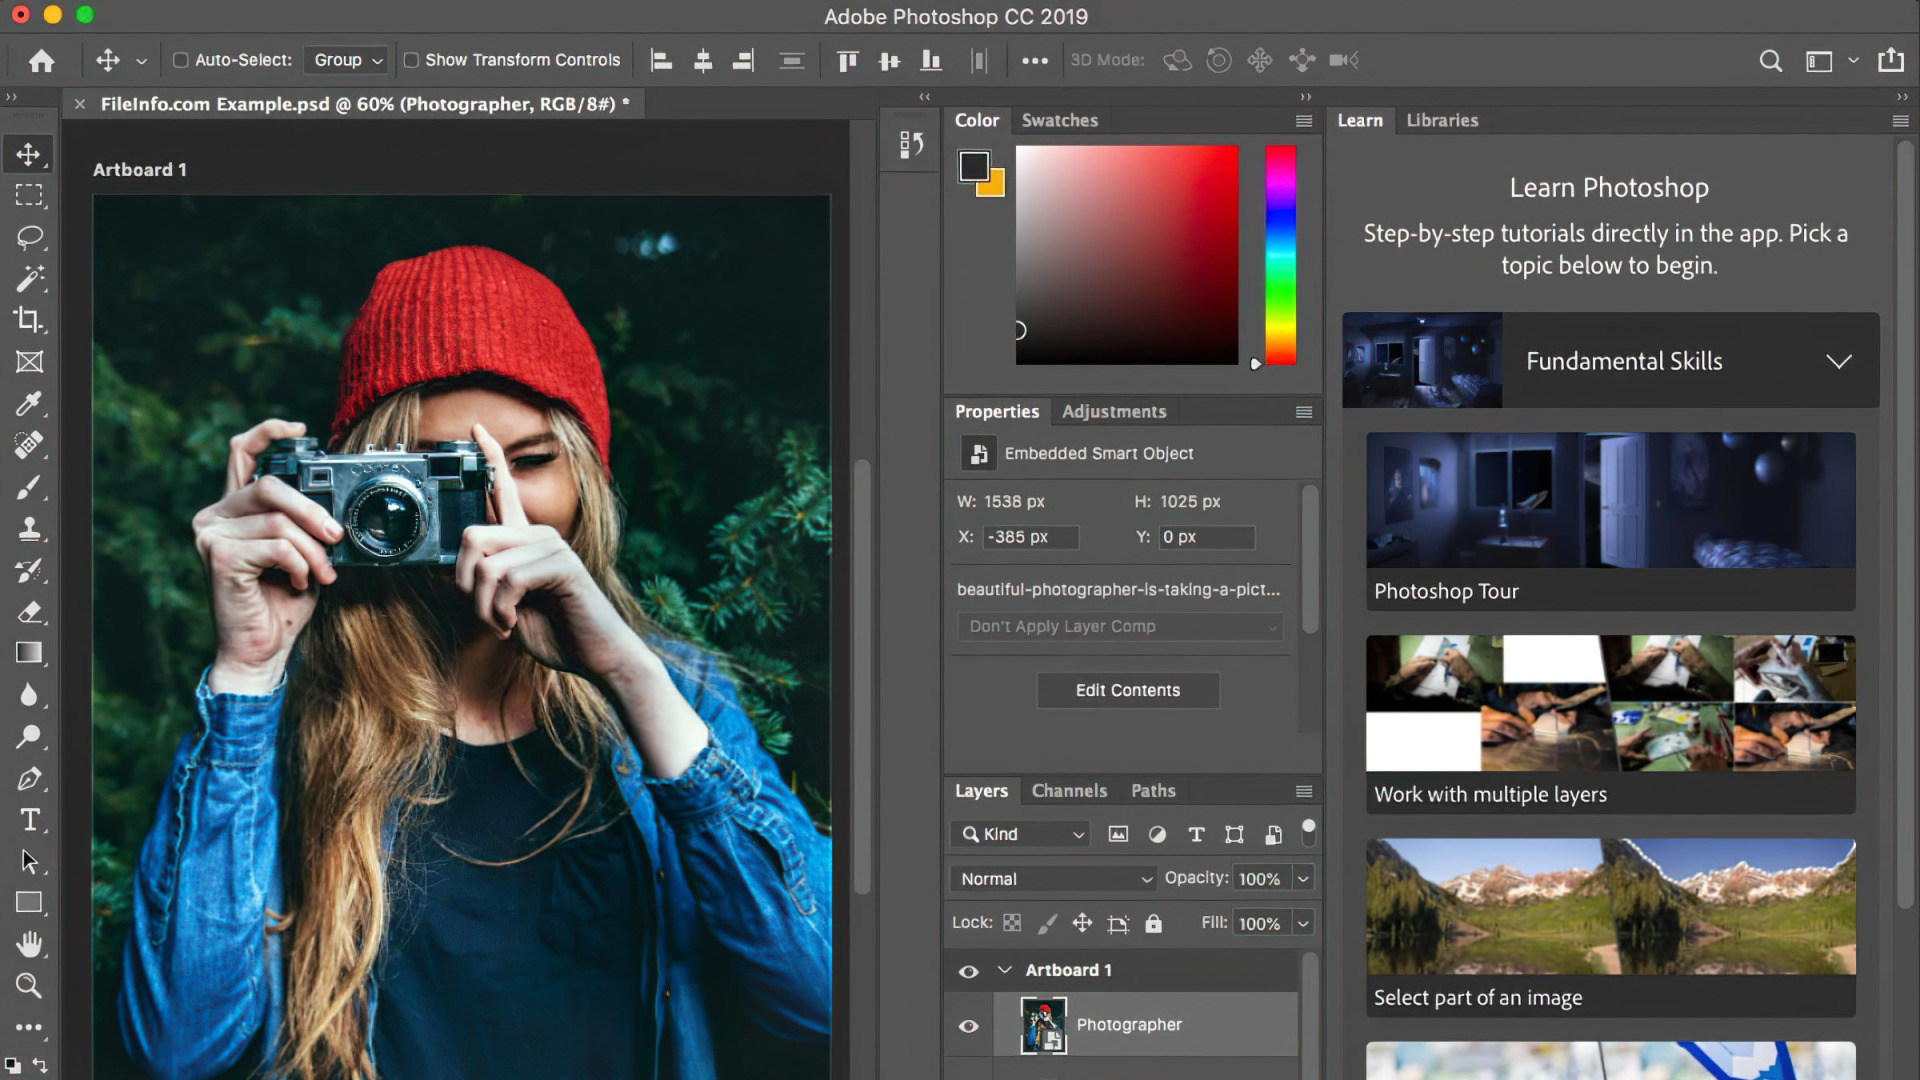 Adobe, Bildbearbeitung, Photoshop, Adobe Photoshop, Creative Cloud